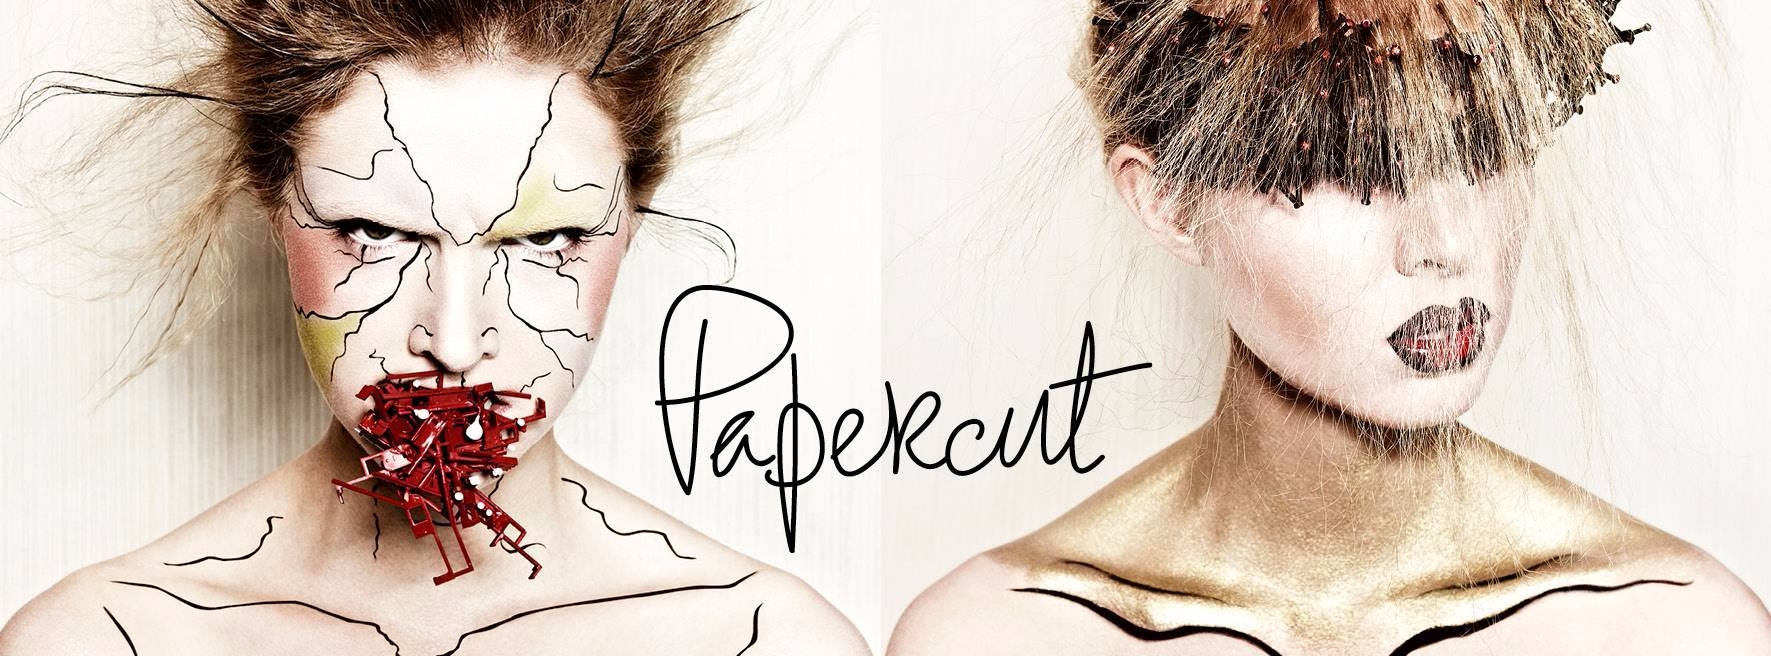 Papercut (@papercutmag) Cover Image